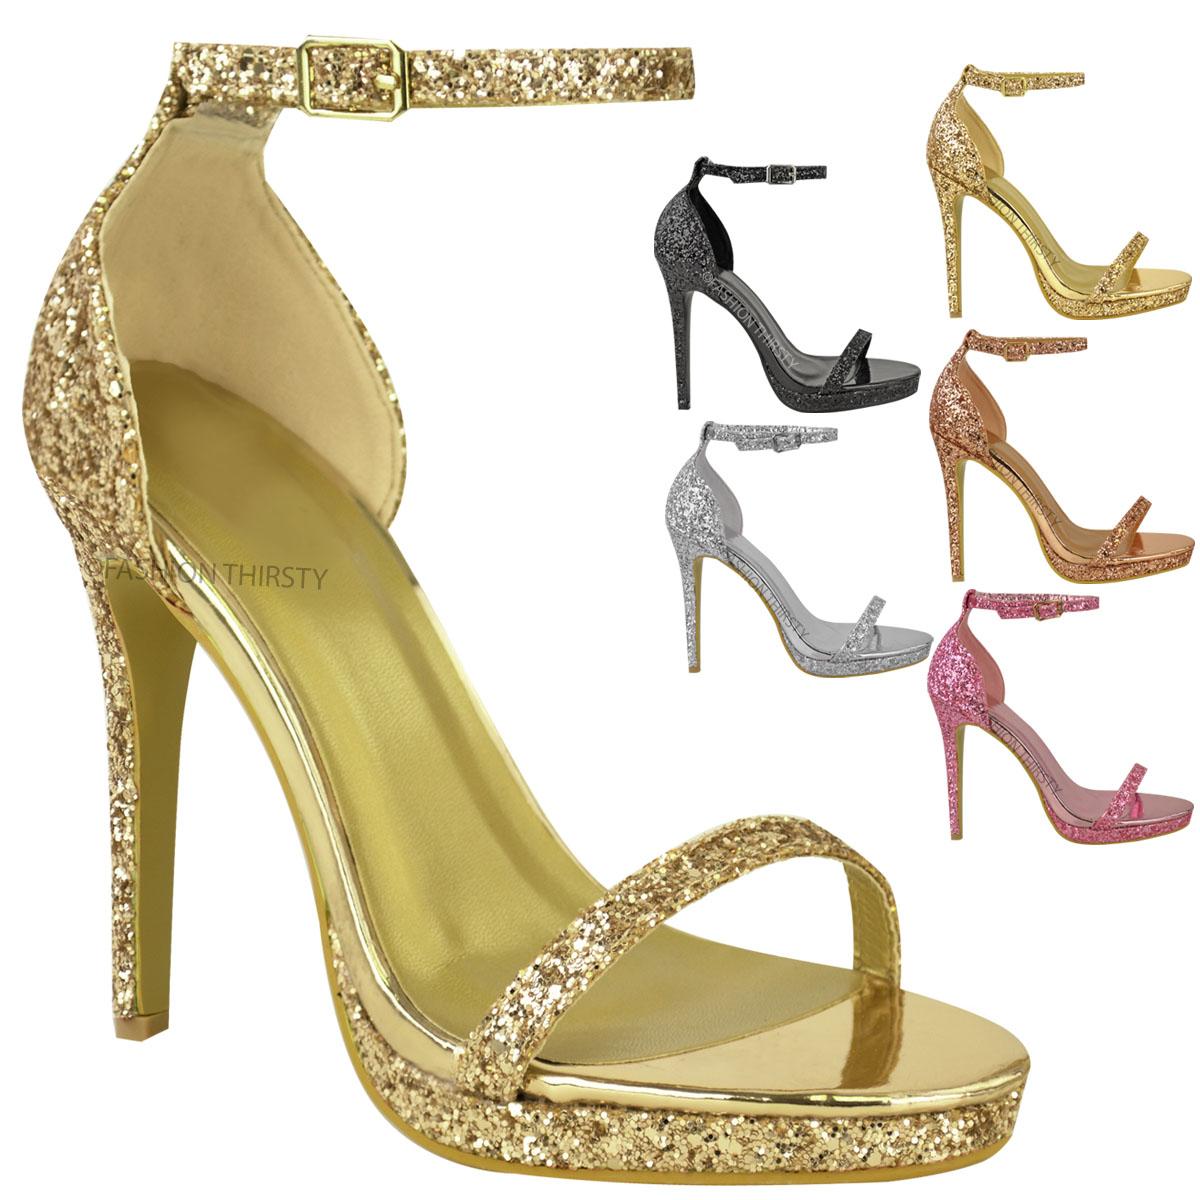 Womens Ladies Platform High Heels Ankle Strappy Glitter